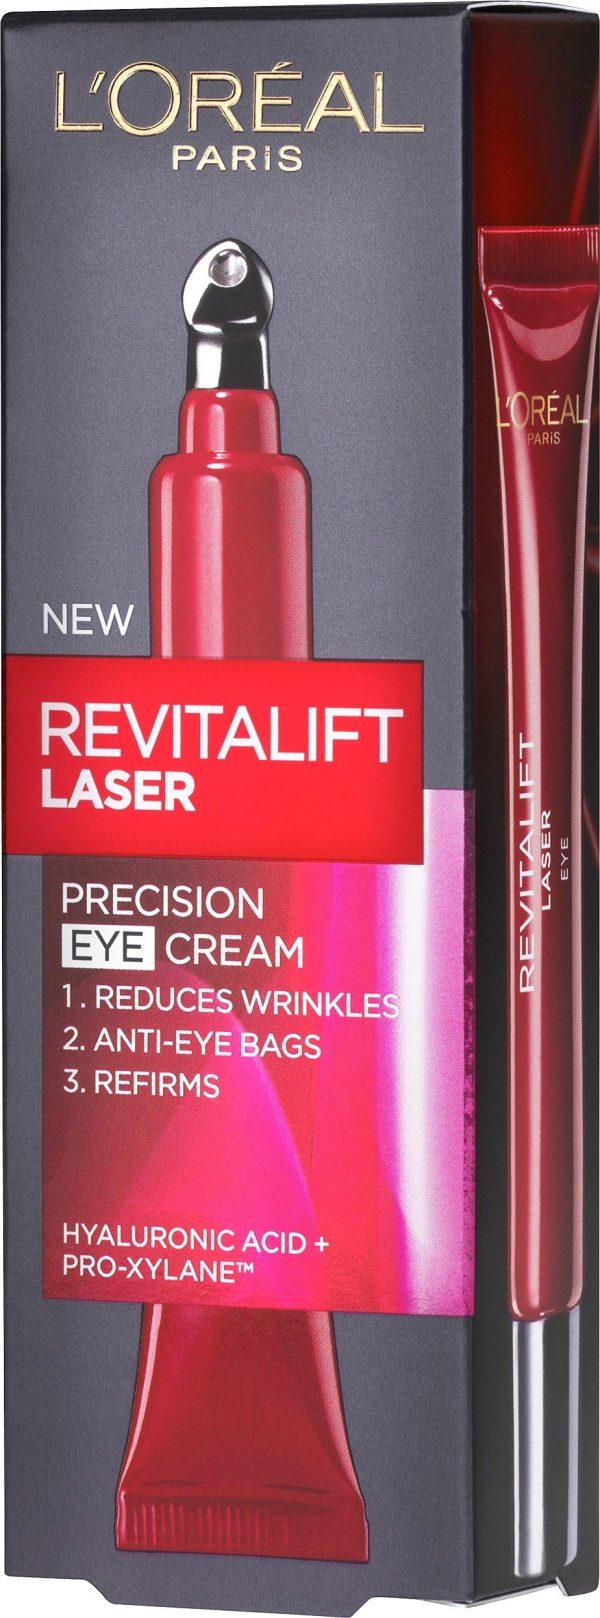 L'Oréal - Revitalift Laser Precision Eye Cream 15 ml